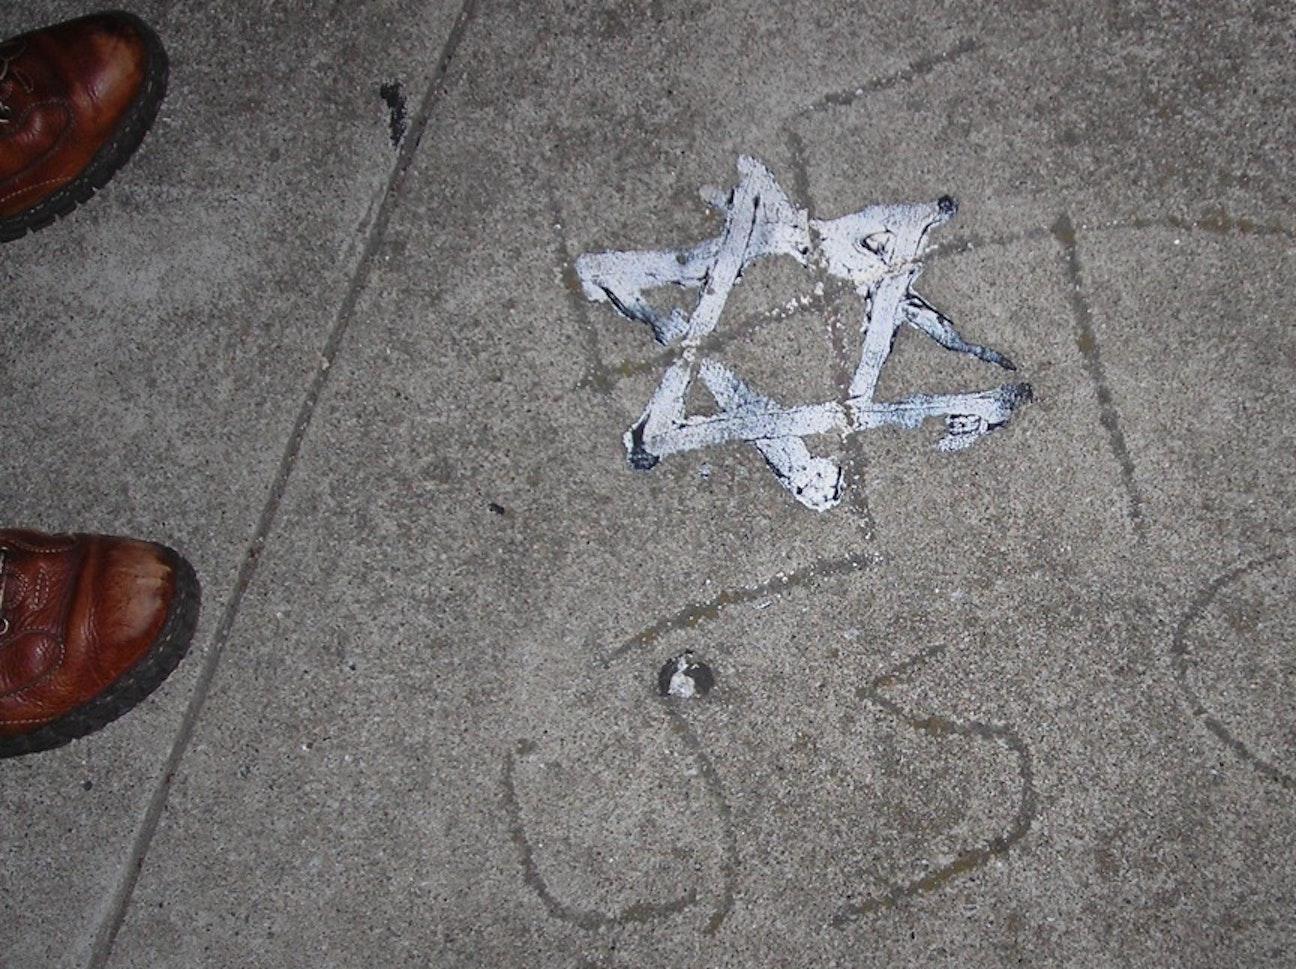 Are Swastikas a Meme Now?